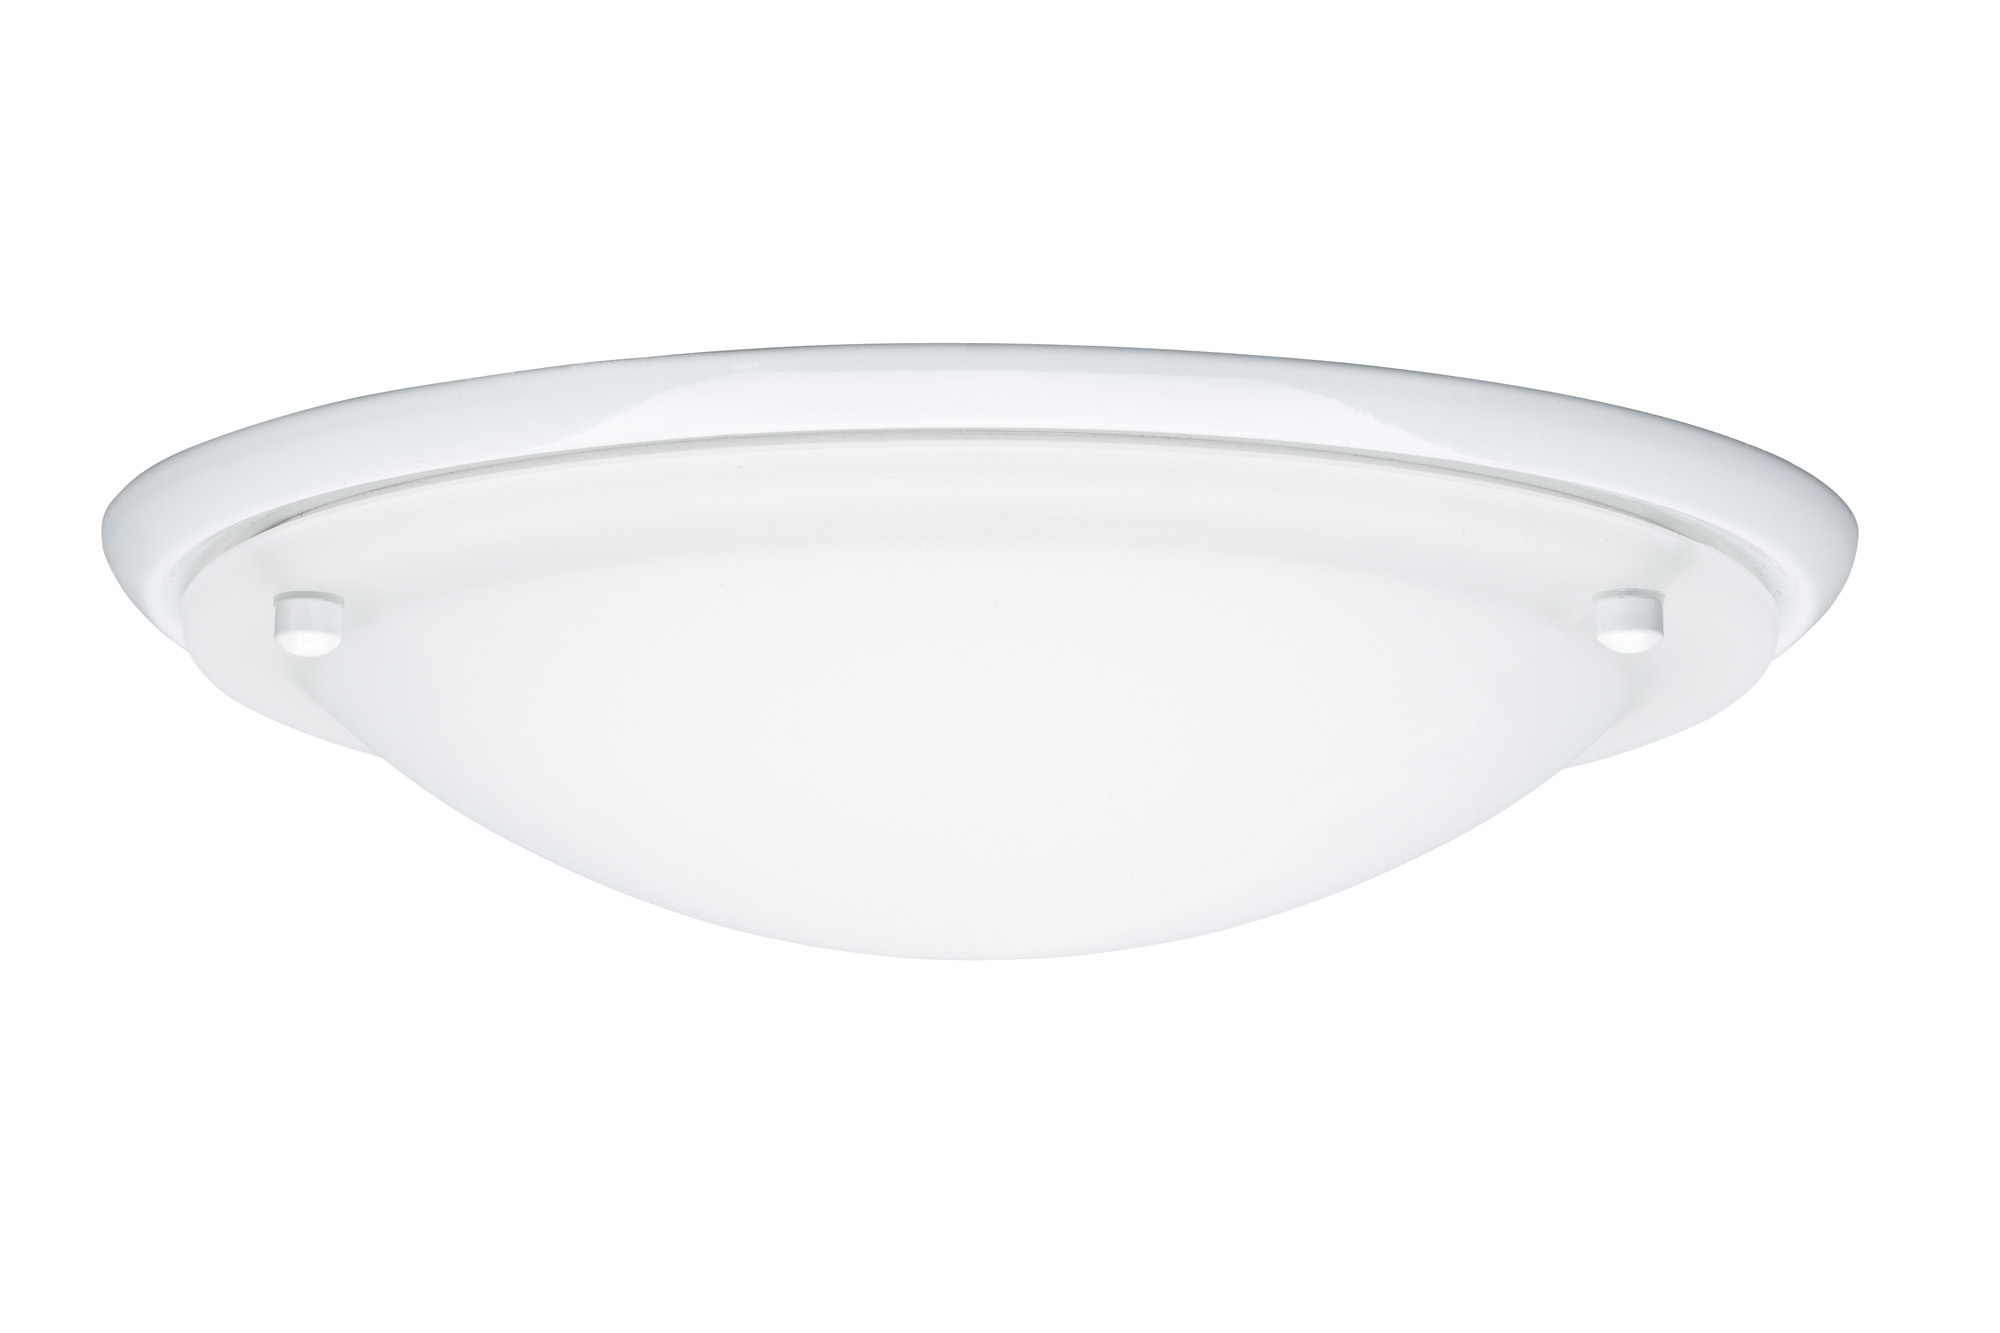 Paulmann. 70343 Светильник настенно-потолочный 1х60W W-D Arctus 230V E27 Белый